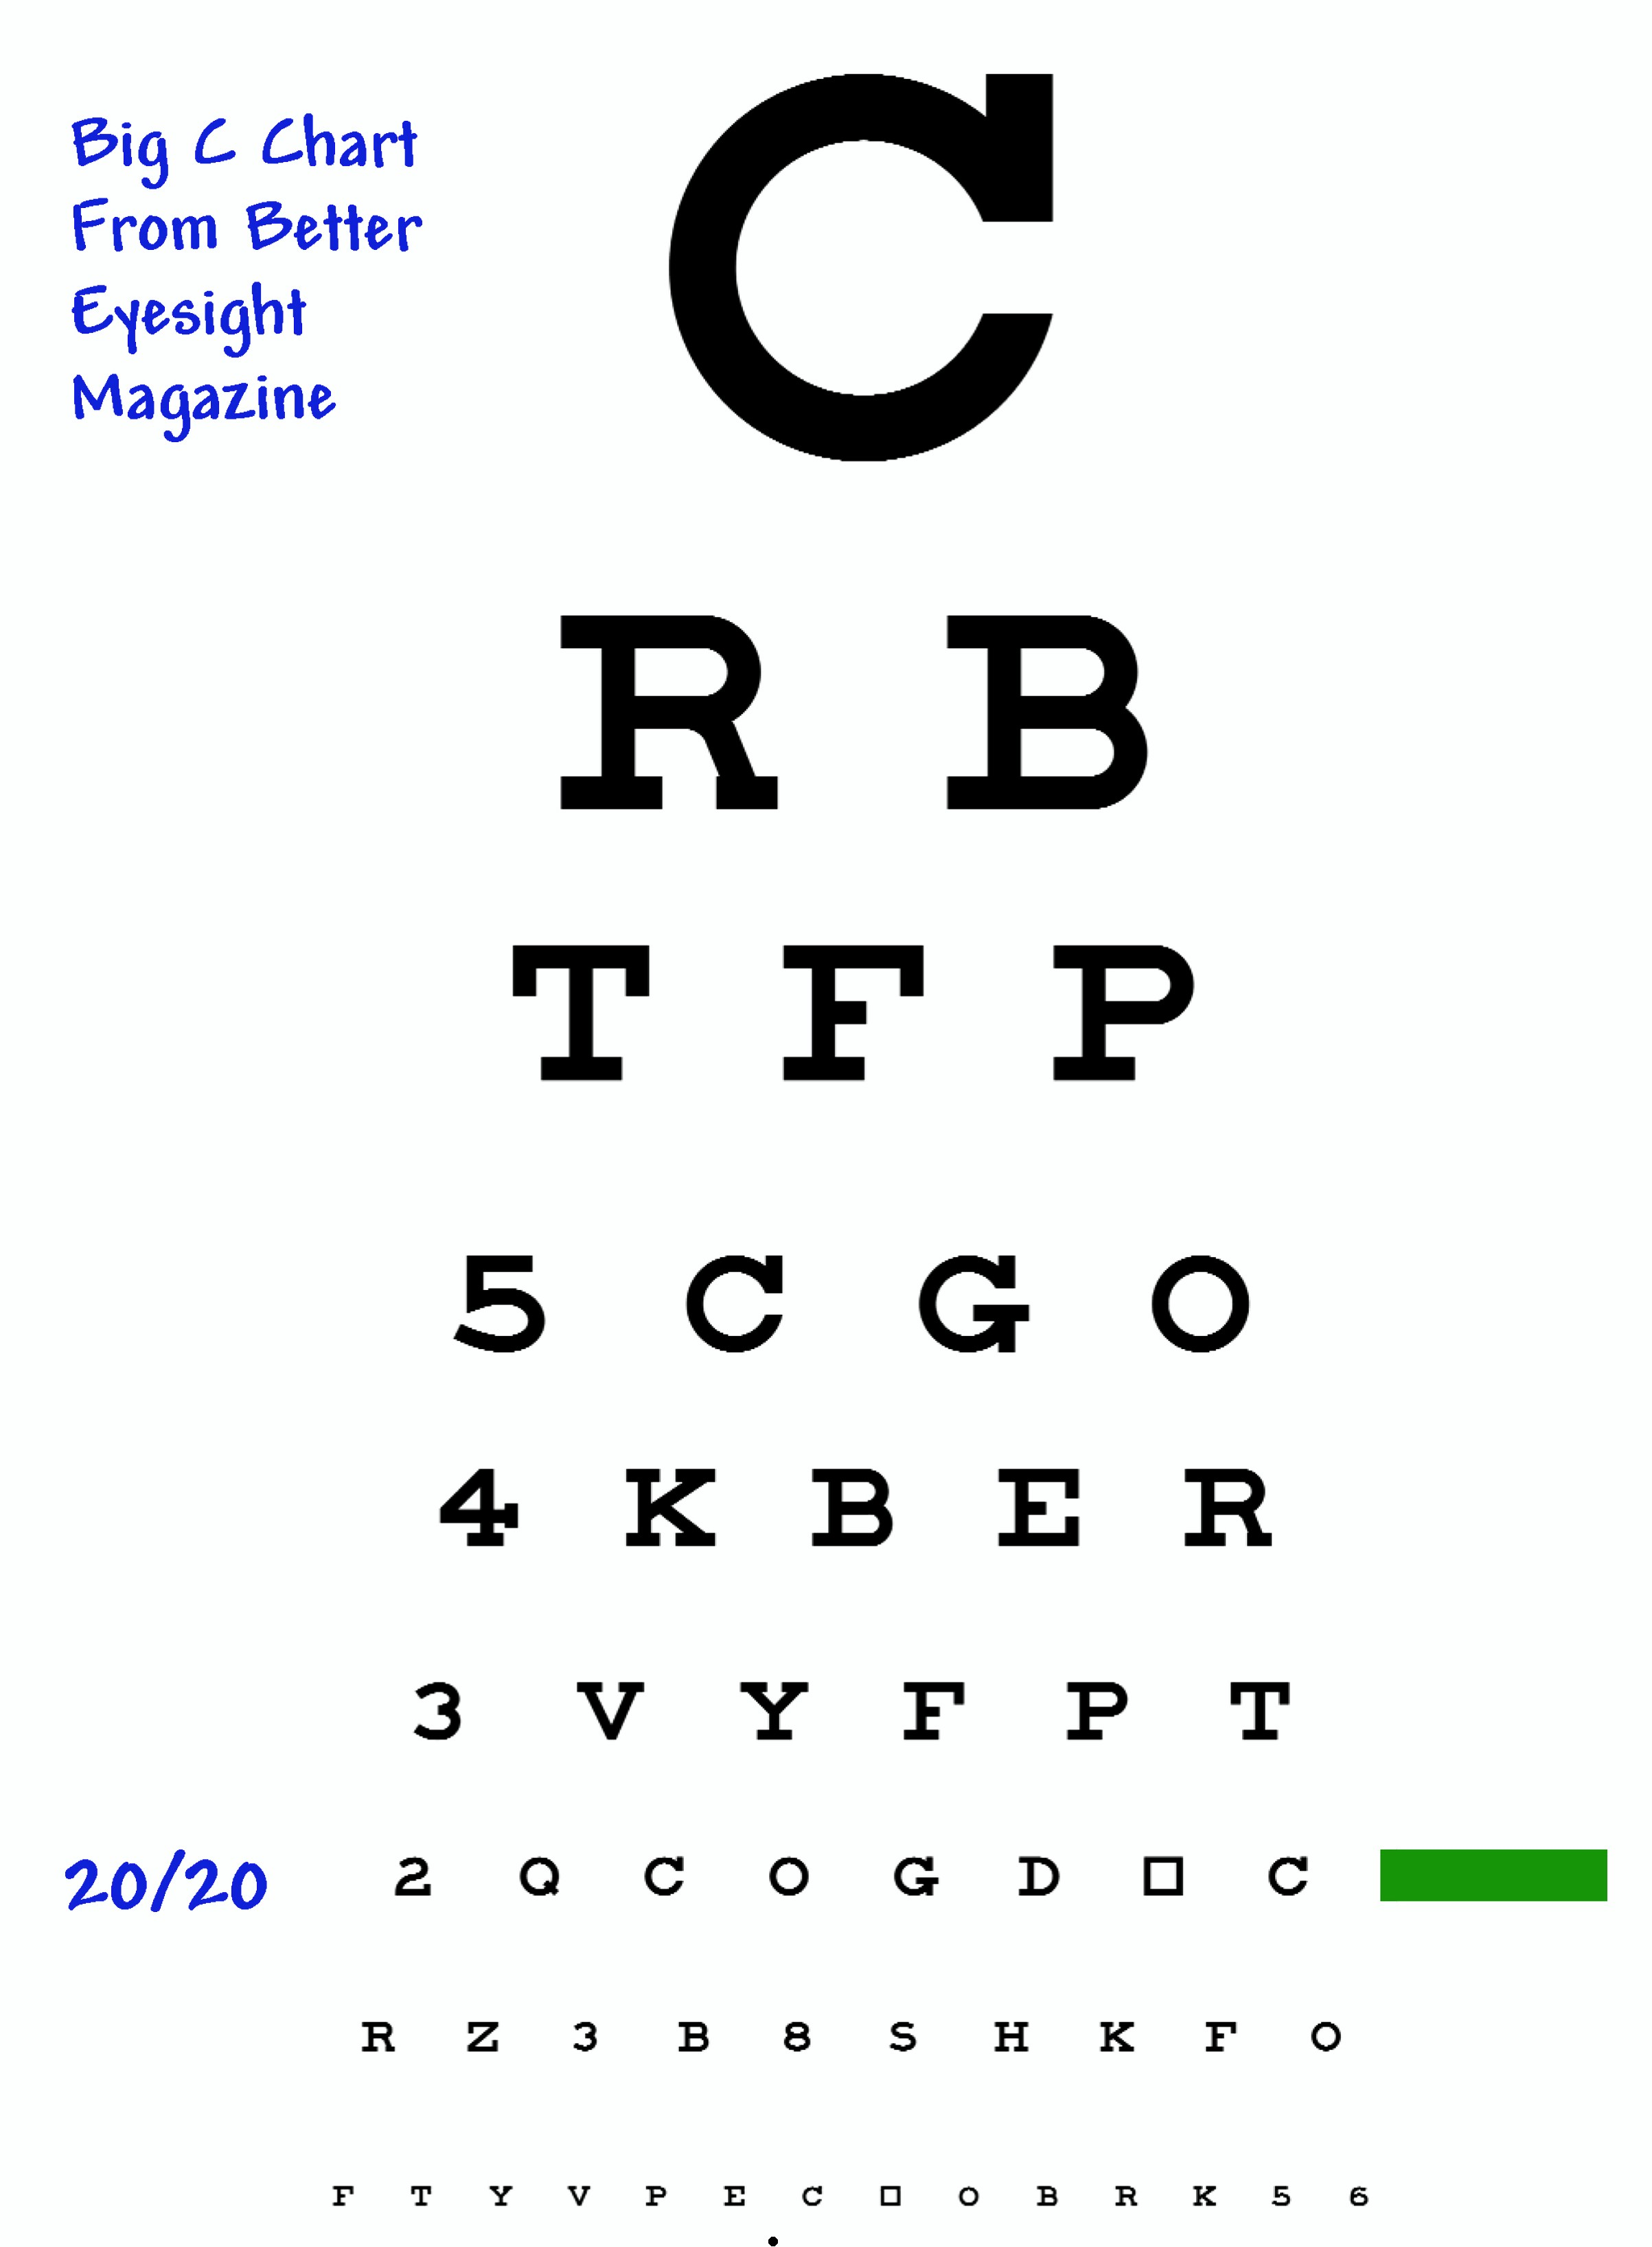 Clear Eyesight At Close Distances